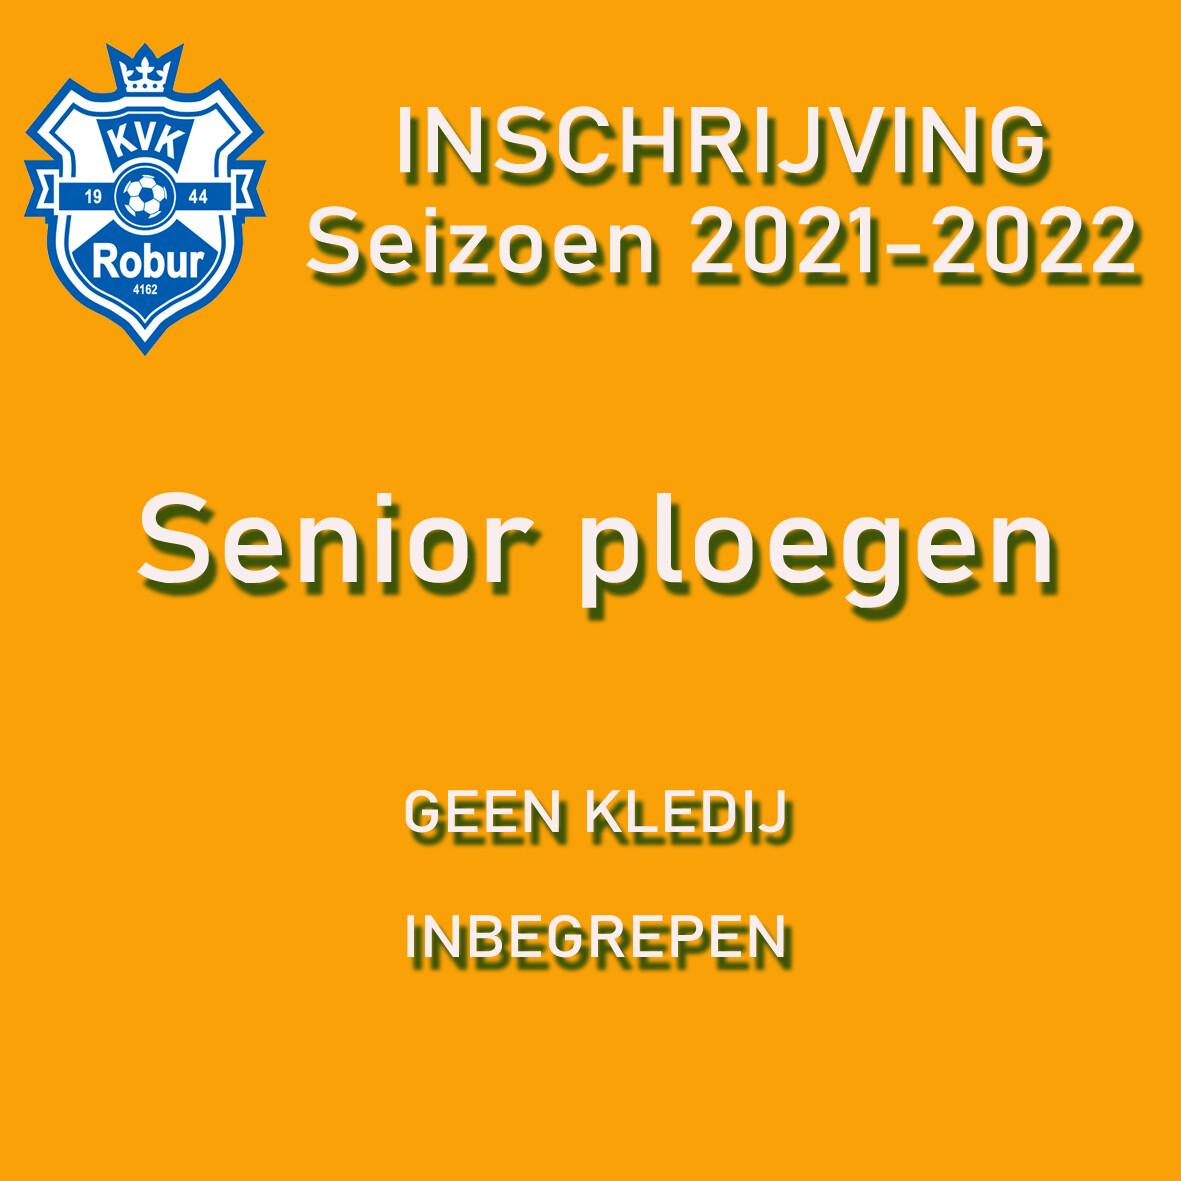 Inschrijving Seizoen 2021 - 2022 - Seniors